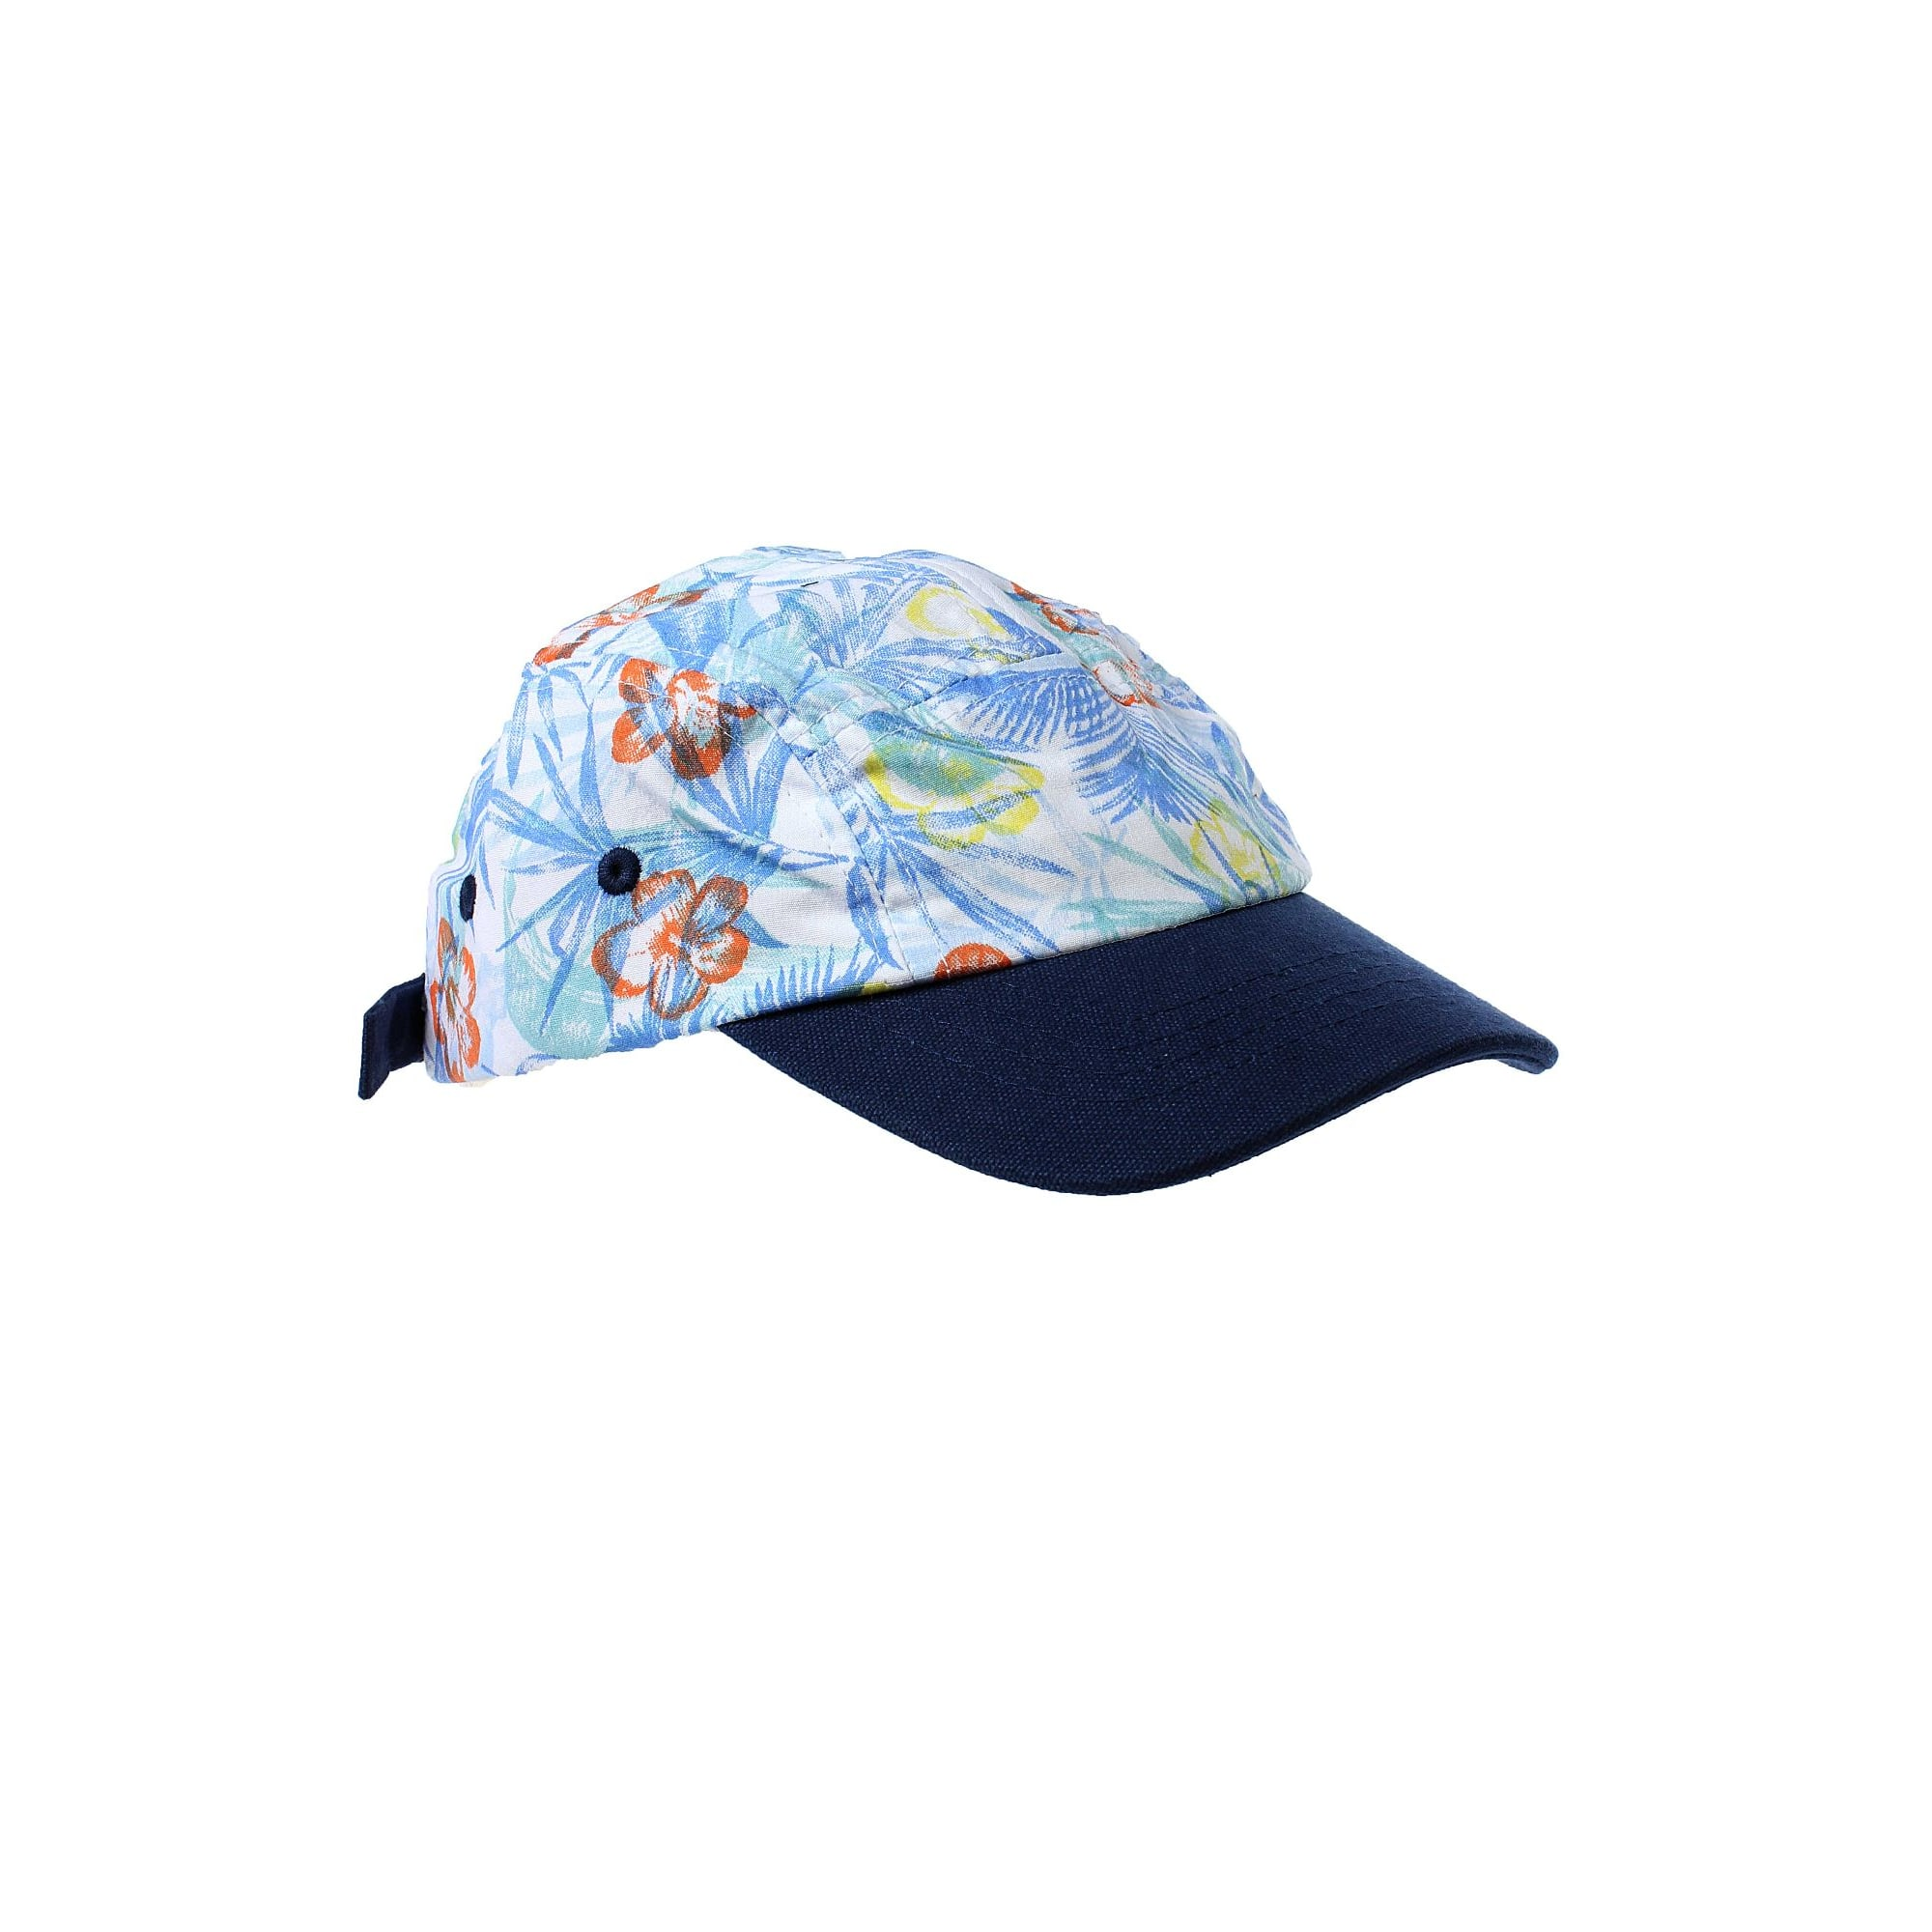 Cap BENETTON Blue, navy, turquoise